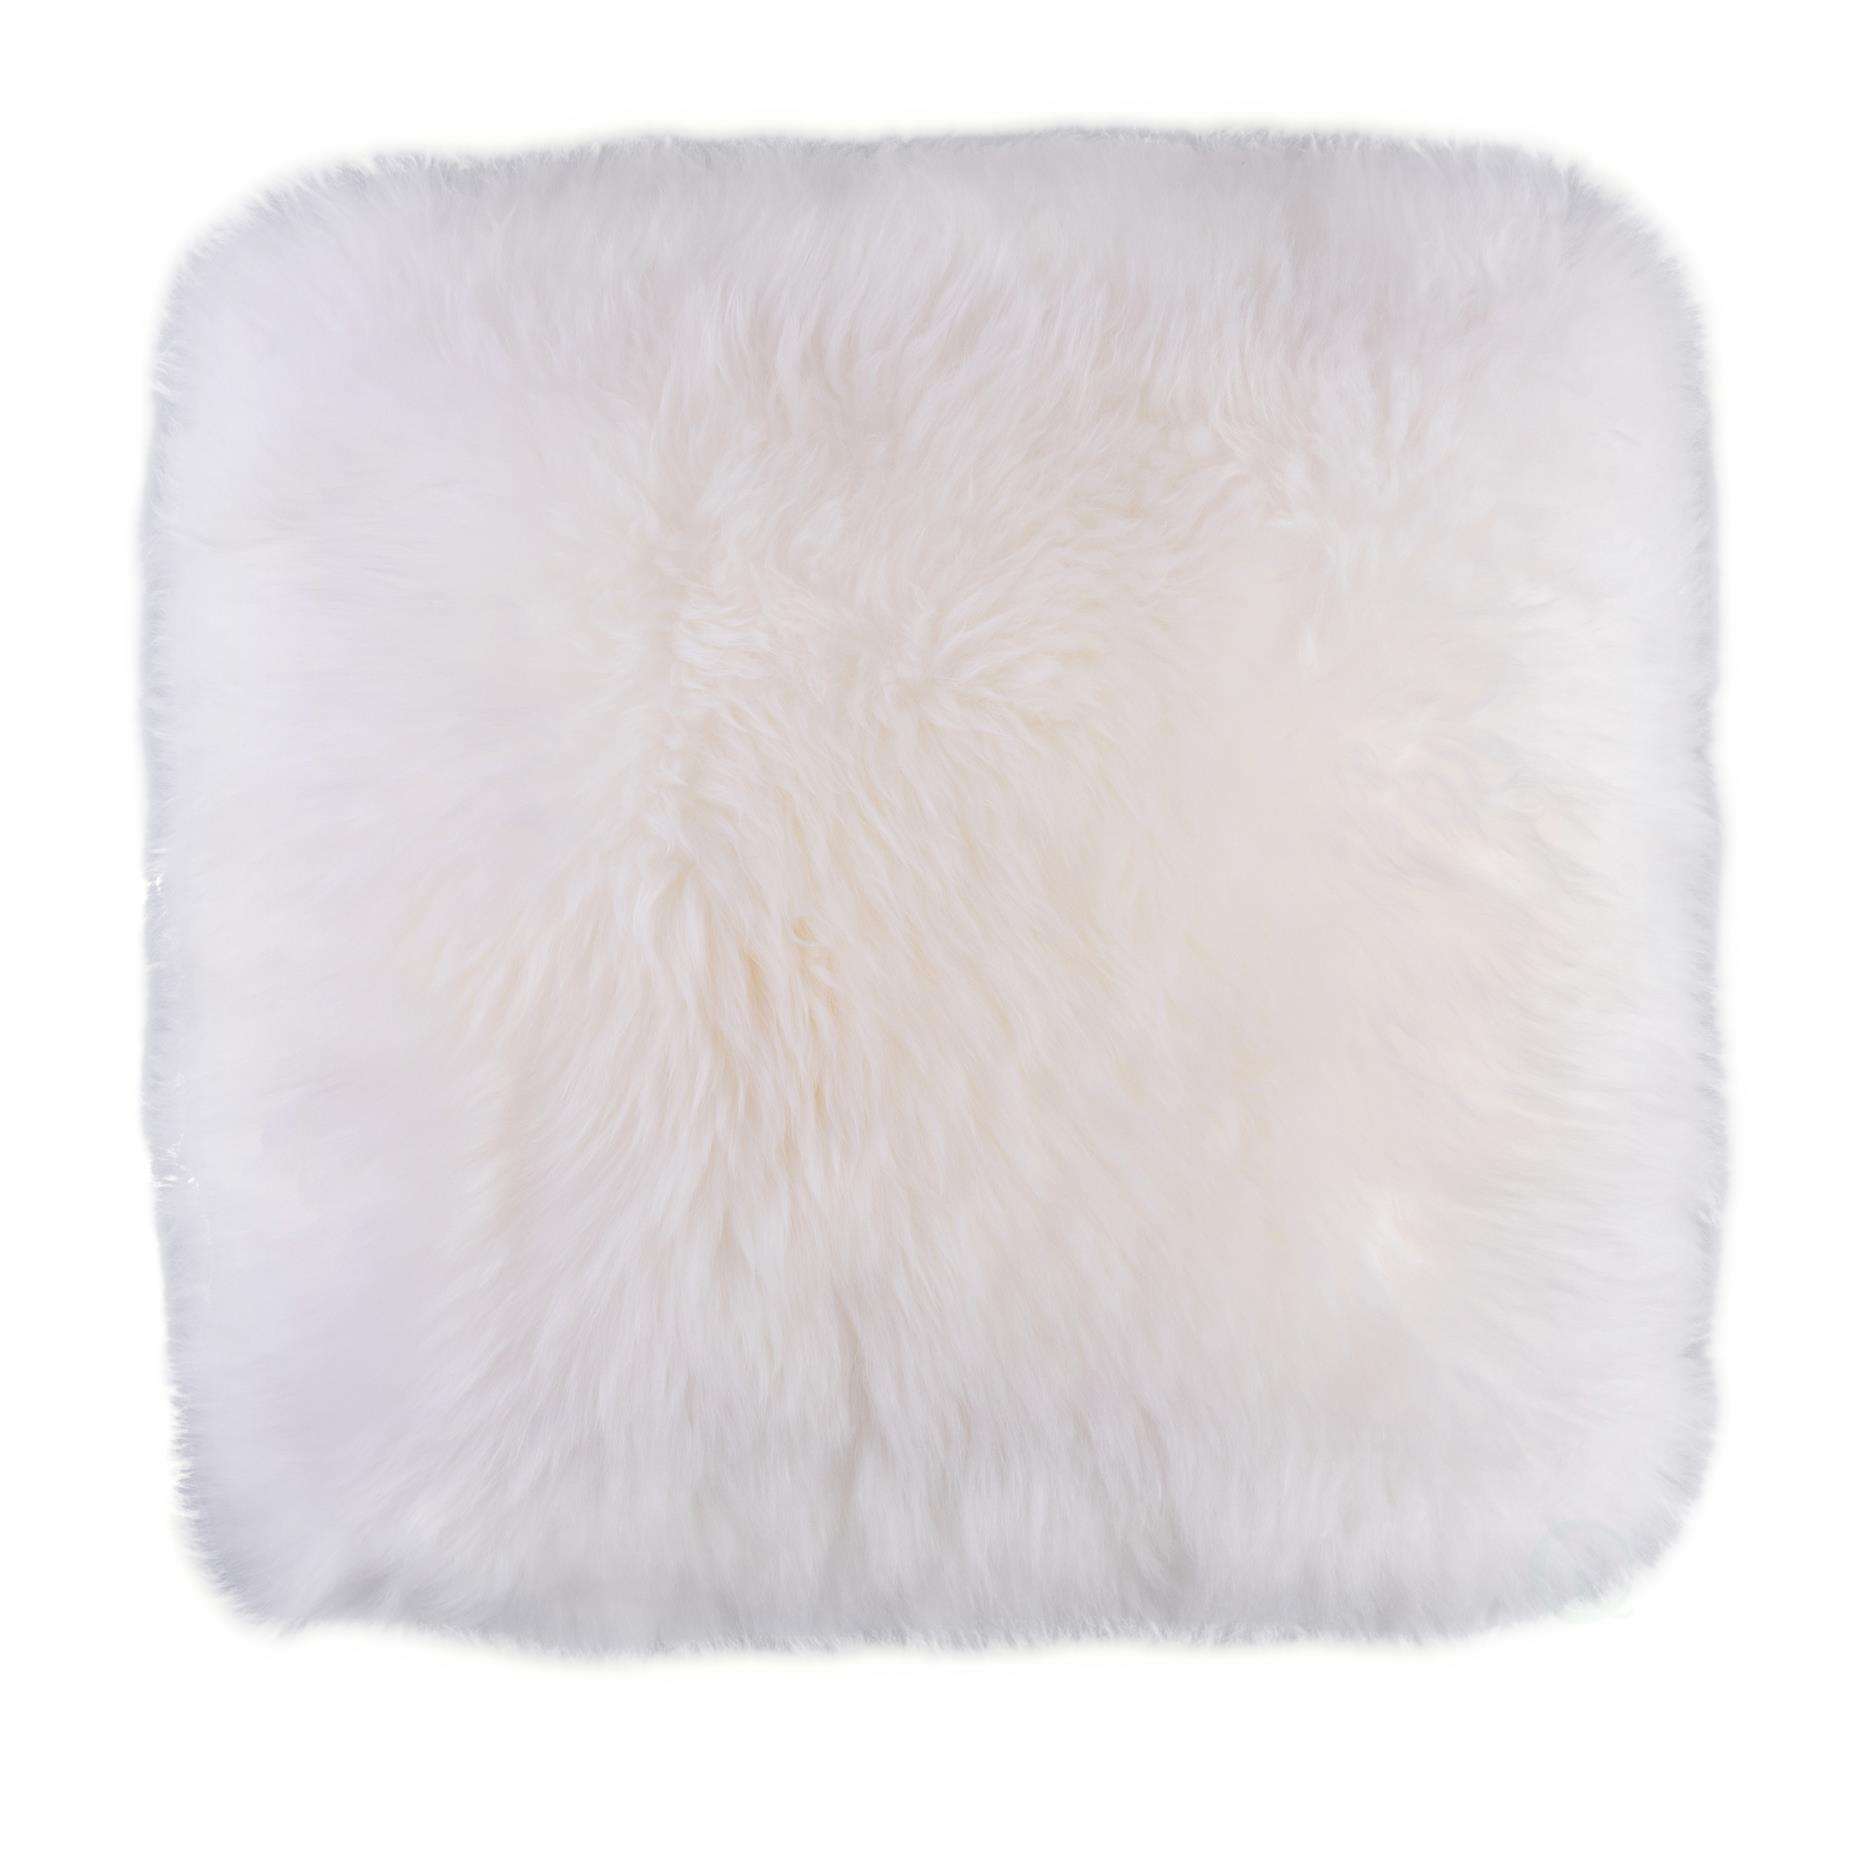 genuine australian lamb fur sheepskin square pillow cover 16 in white